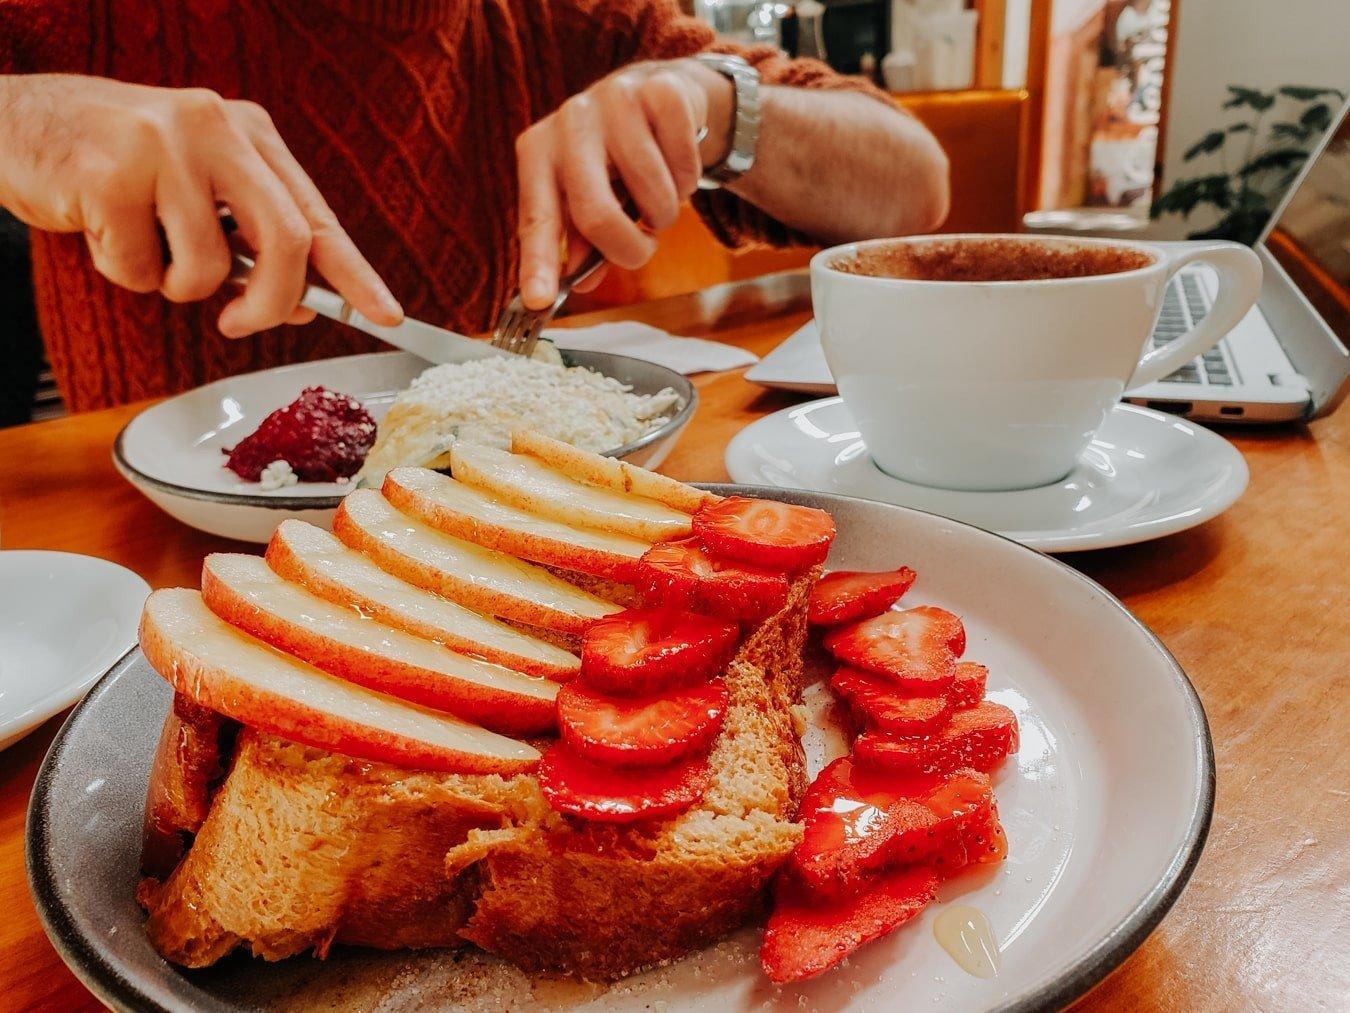 cafeologia breakfast in san cristobal